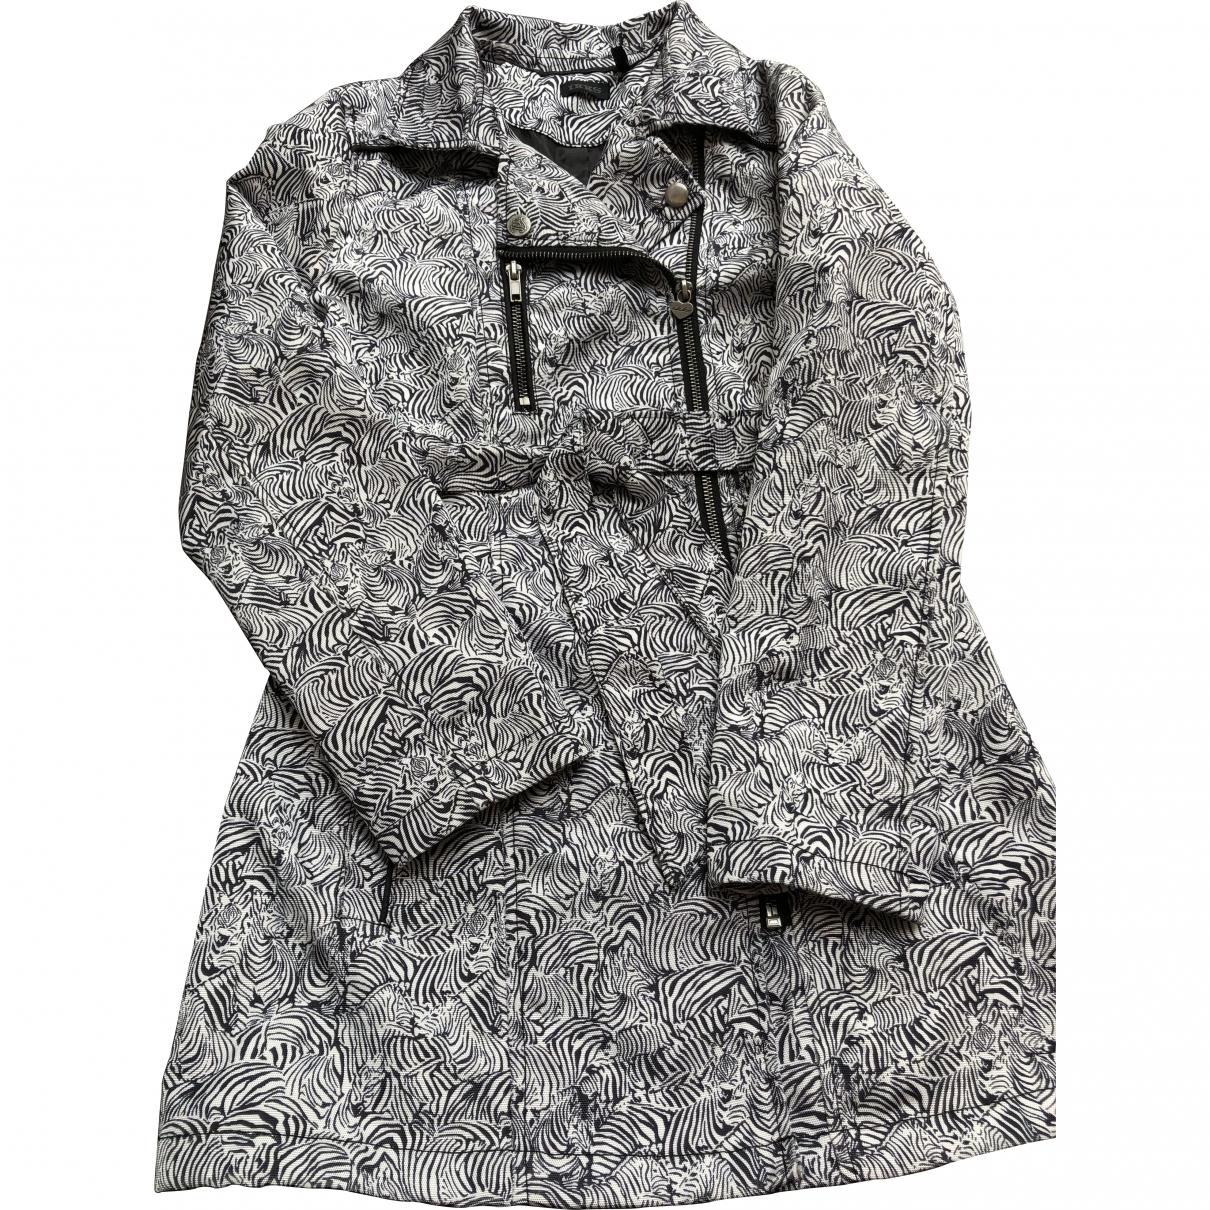 Ikks \N Black jacket & coat for Kids 10 years - up to 142cm FR